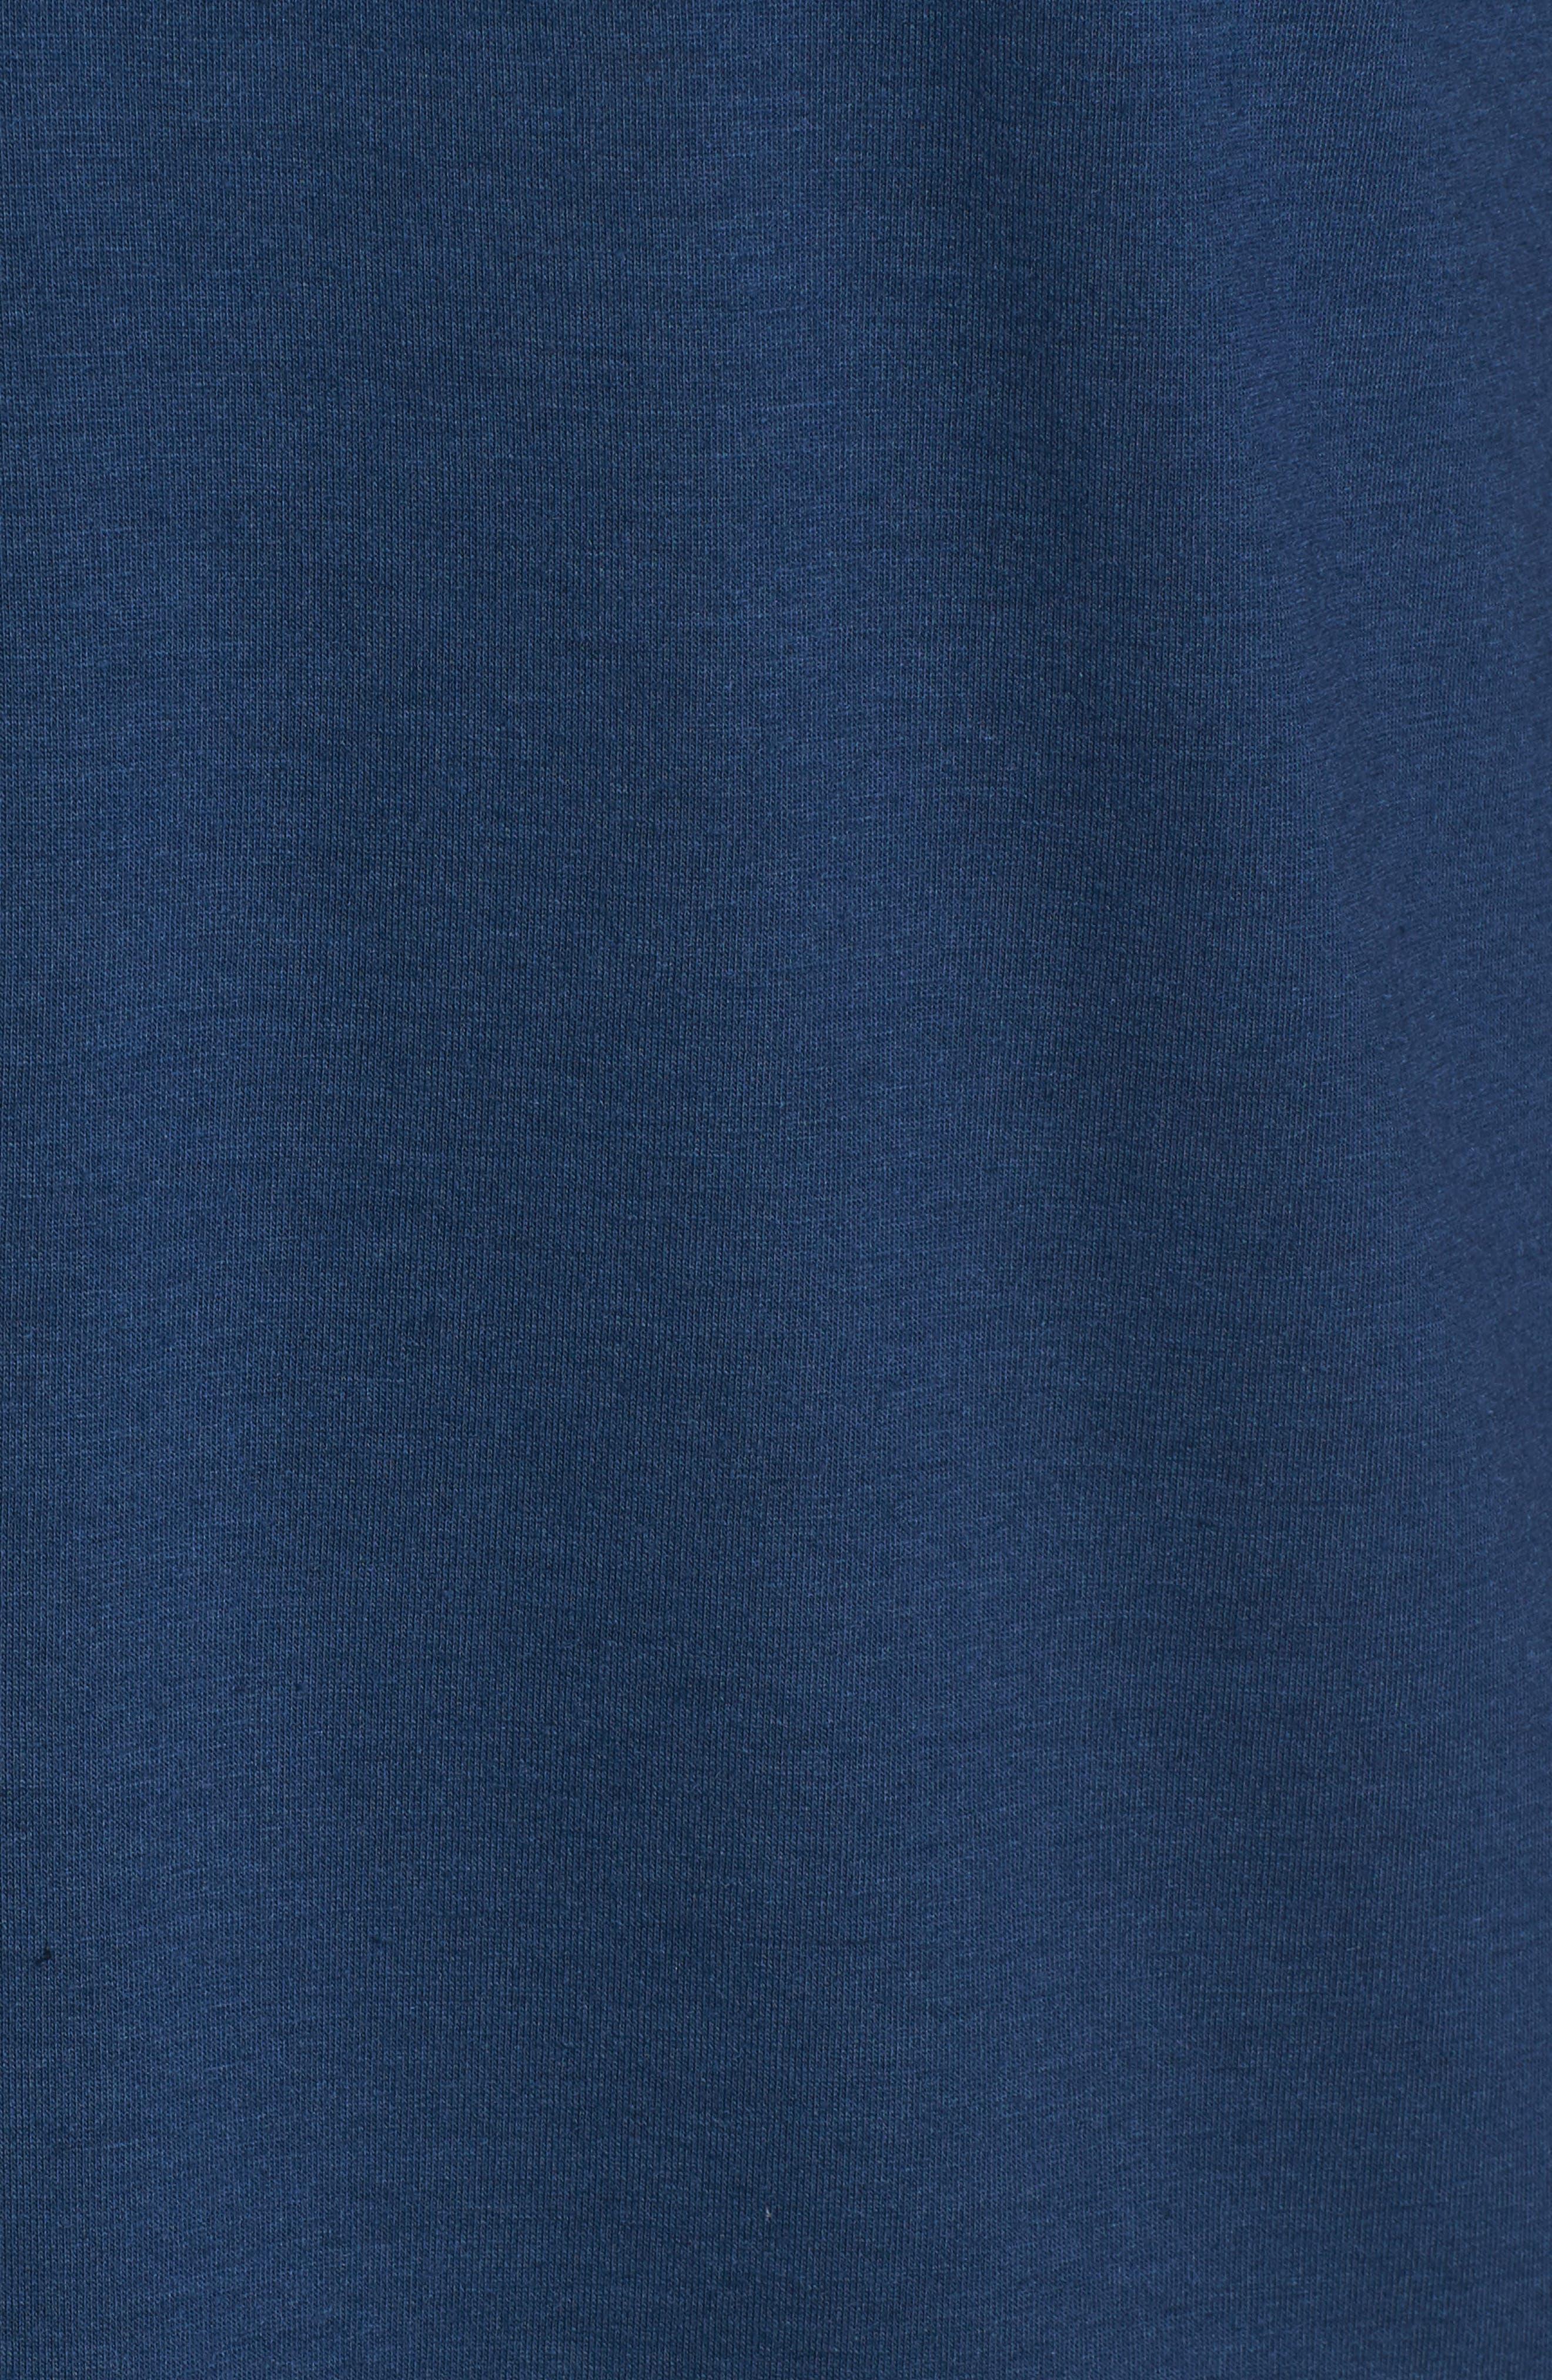 Tigua Short Sleeve Henley,                             Alternate thumbnail 5, color,                             411